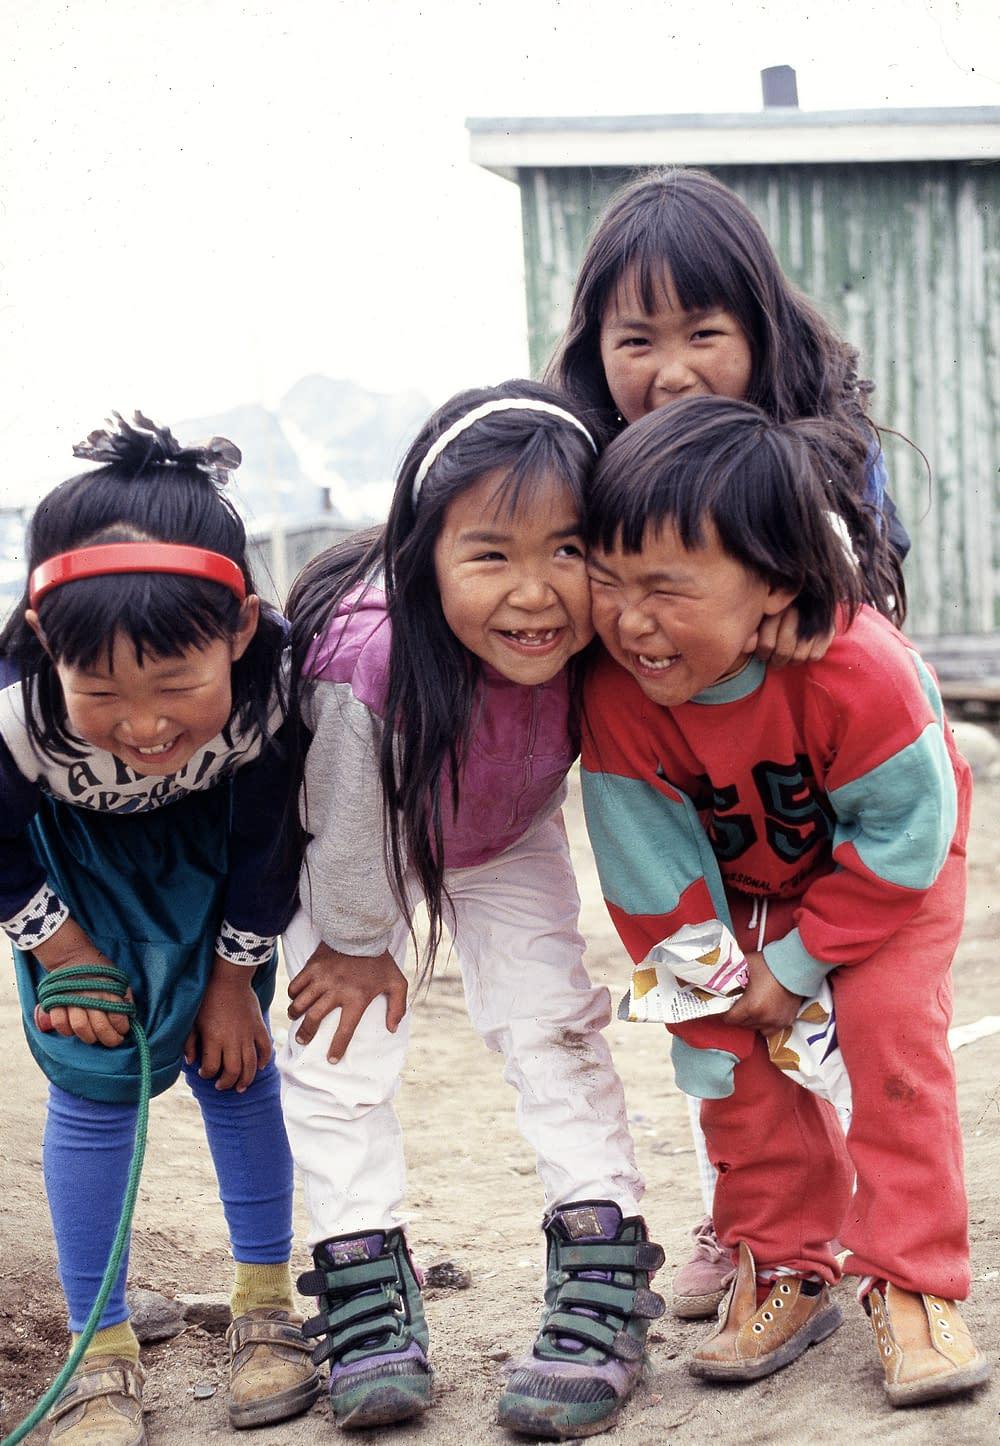 Children in Kungmiut, East Greenland 1993